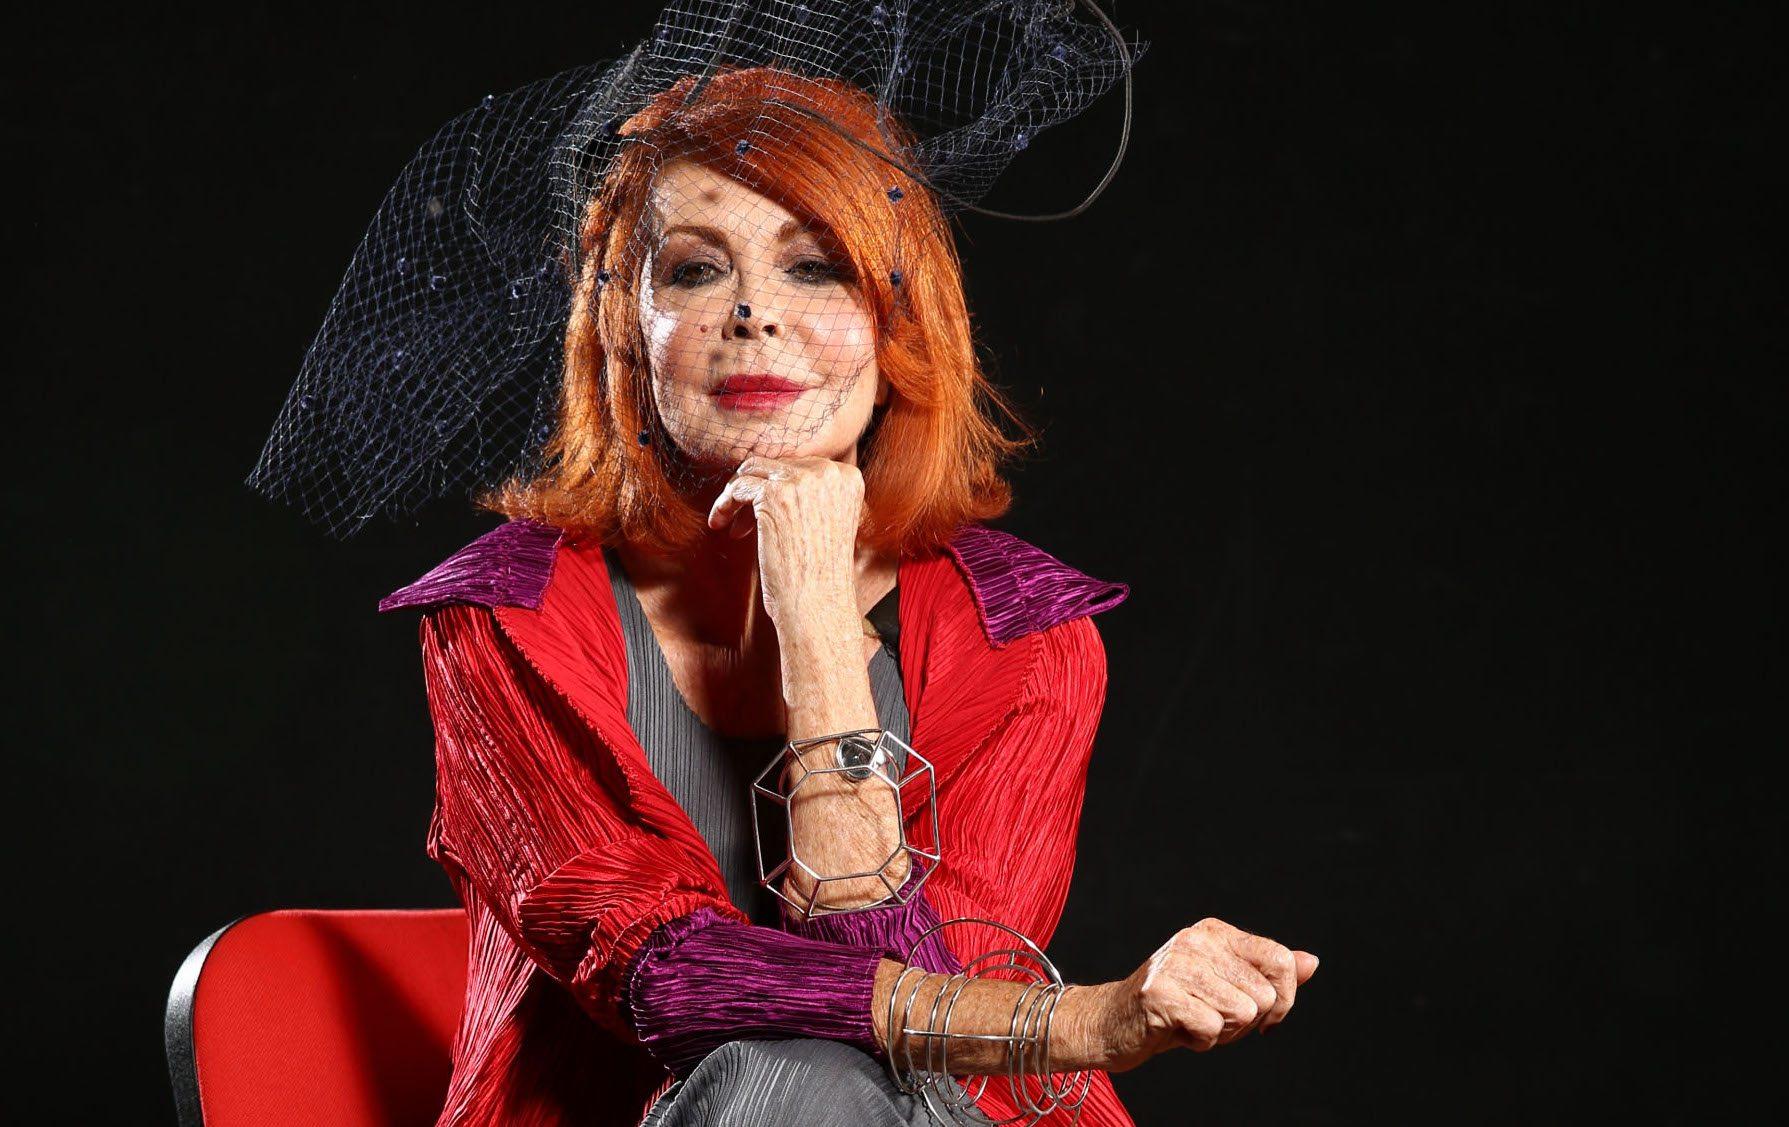 Marina Ripa di Meana morte cancro